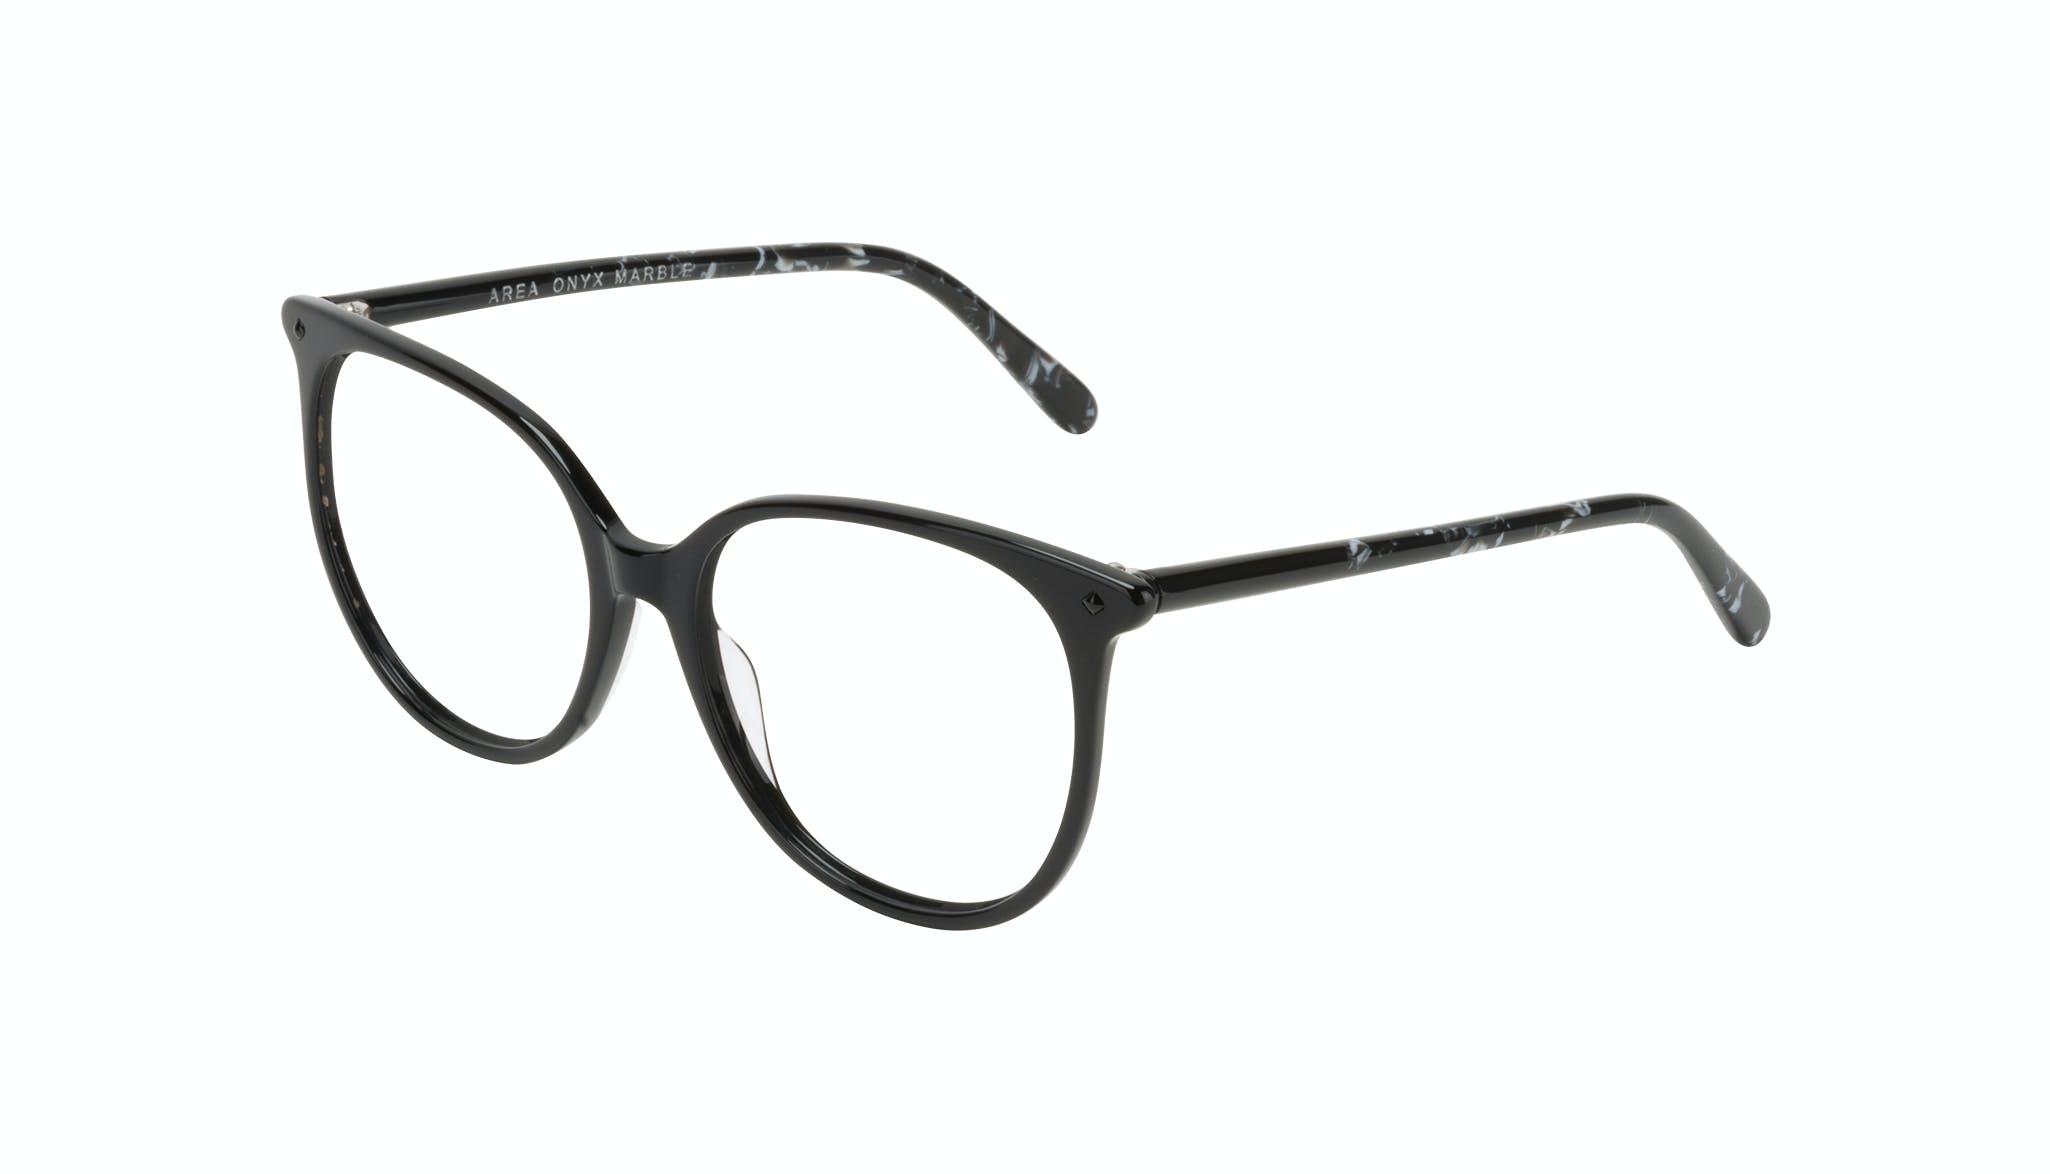 Affordable Fashion Glasses Round Eyeglasses Women Area Onyx Marble Tilt